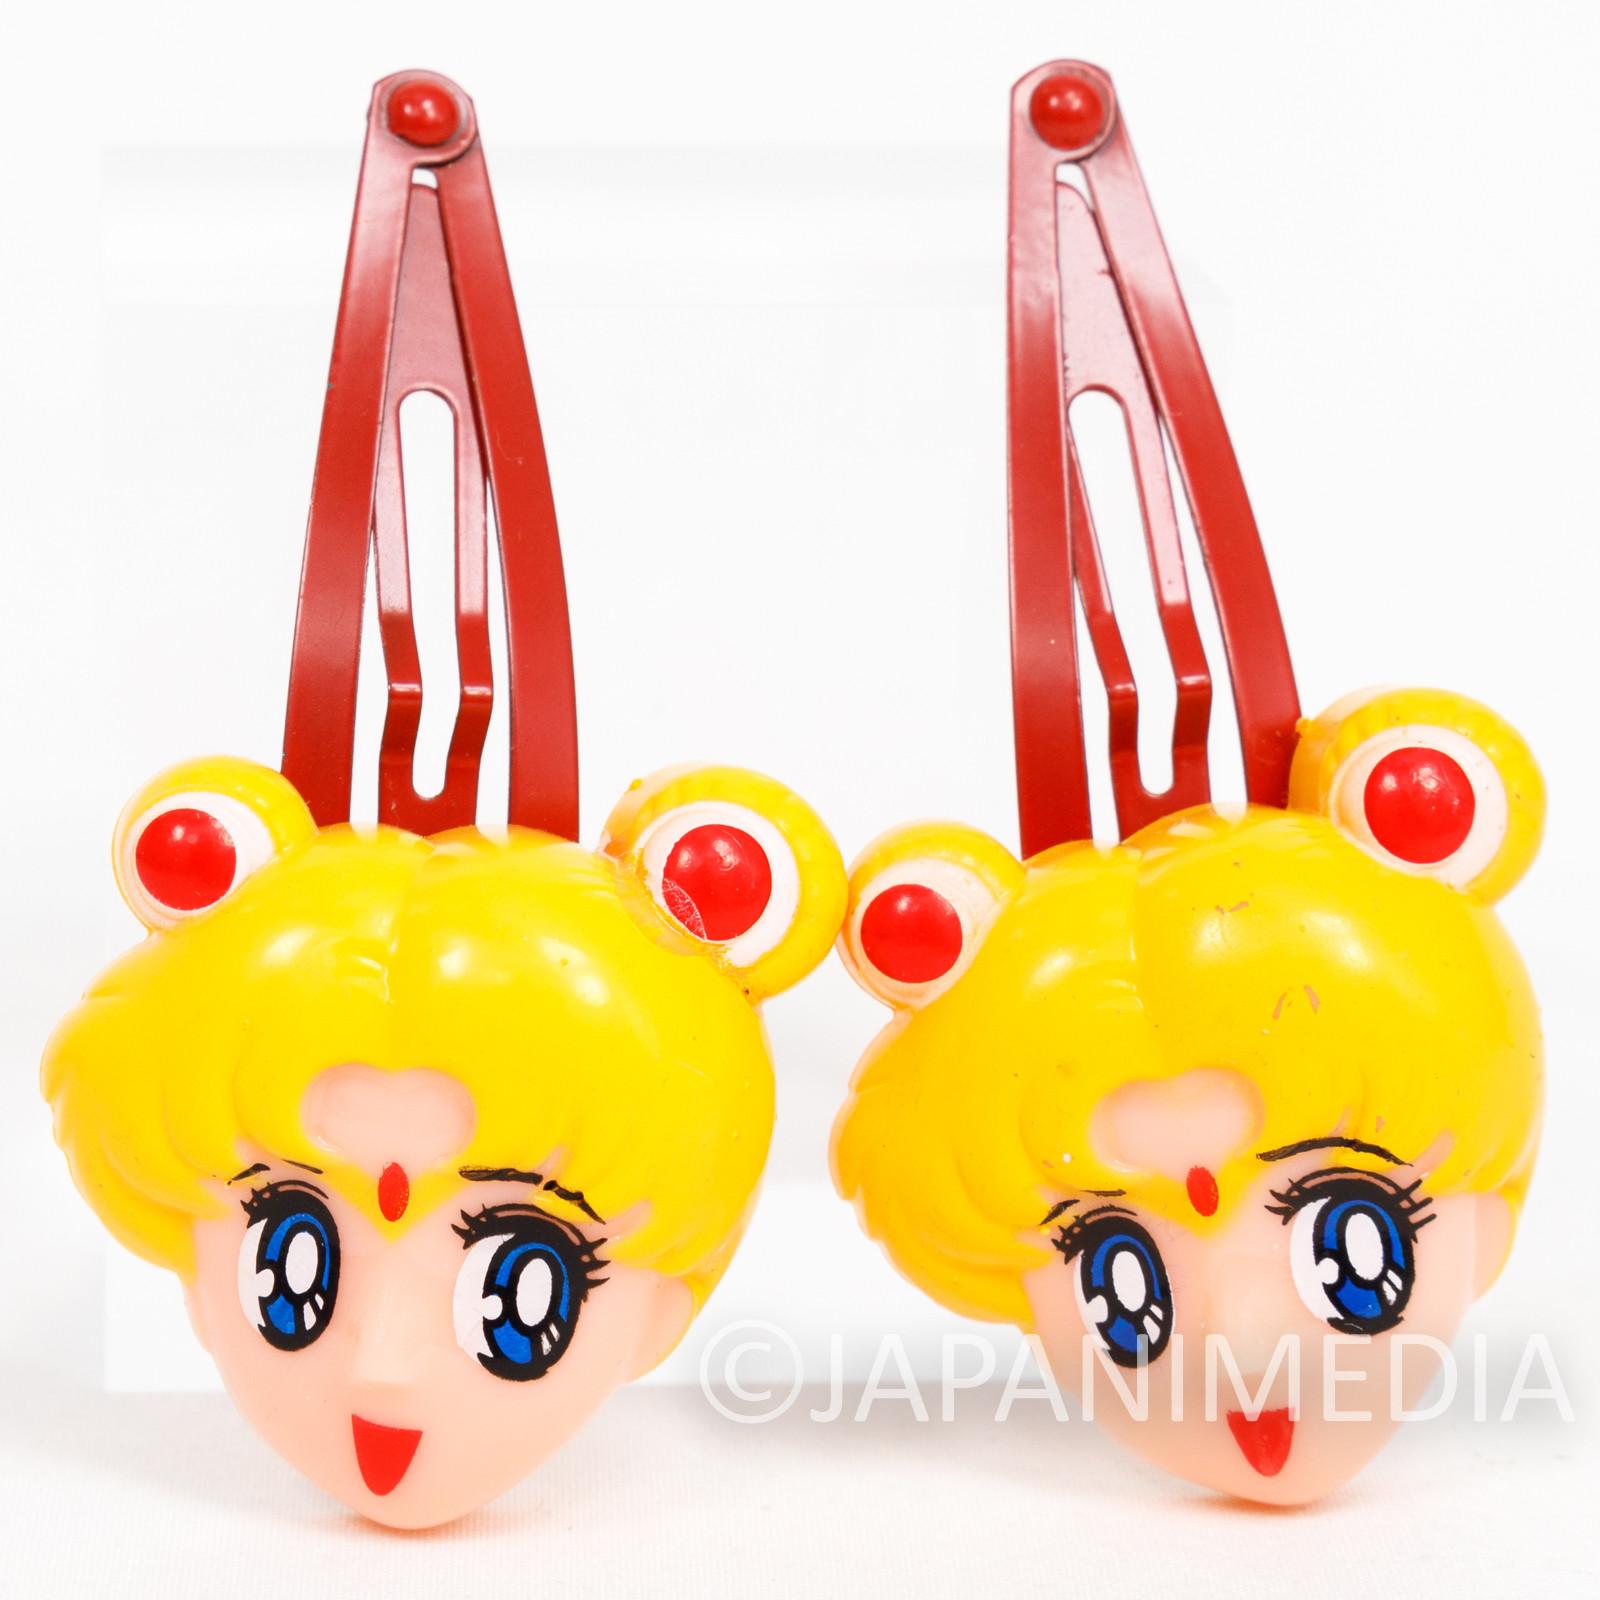 Retro RARE!! Sailor Moon Mascot Hair Clip Accessory Set JAPAN ANIME MANGA